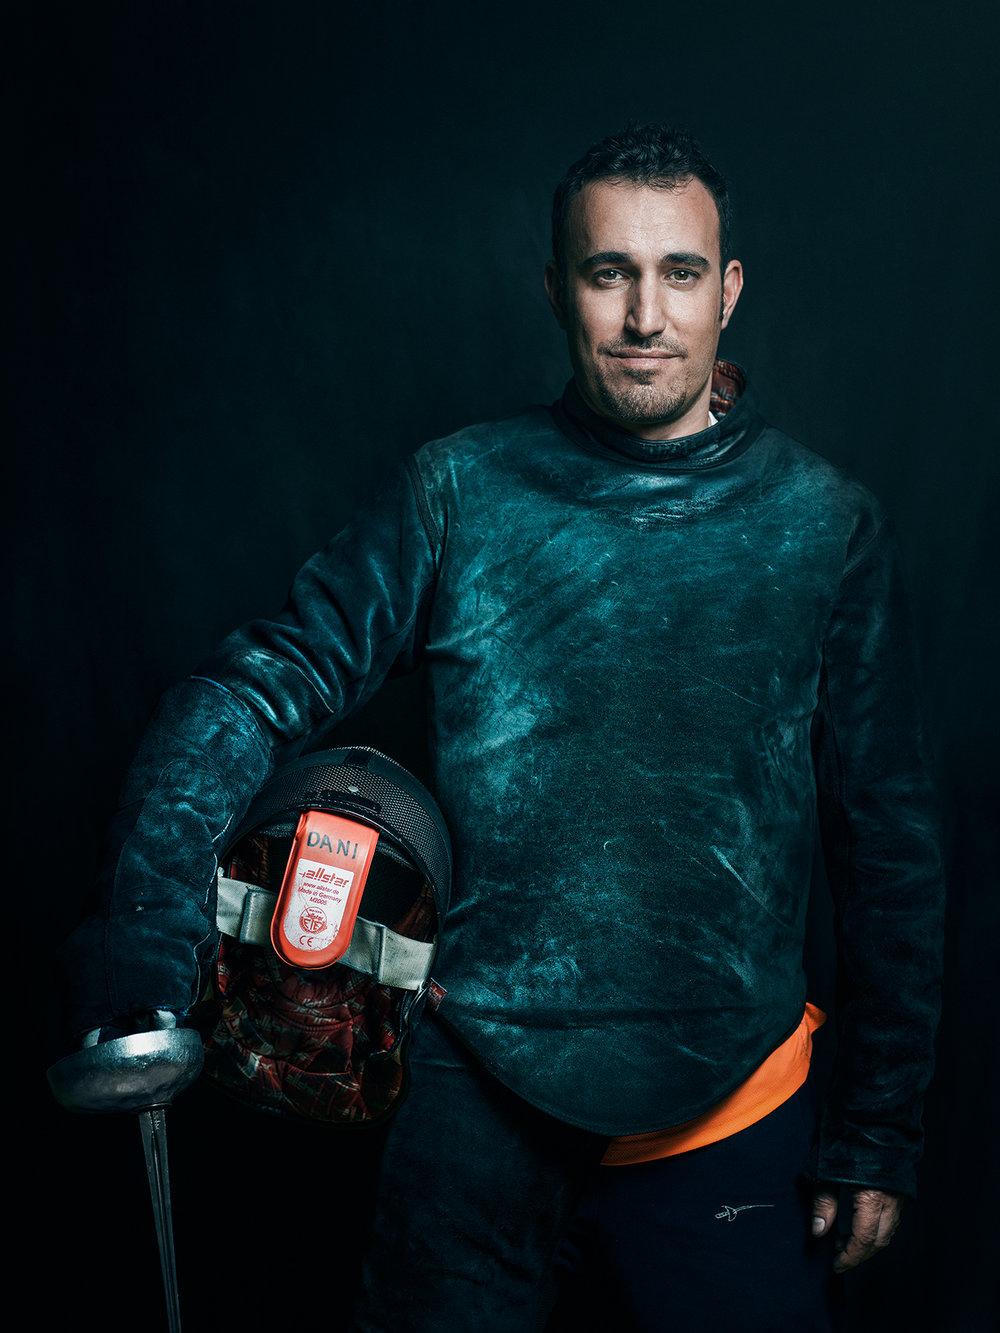 Oscar-arribas-esgrima-maestro-fencing-master-fencer-fechten-scherma-escrime-portrait-fotografo-retrato-photographer030.jpg